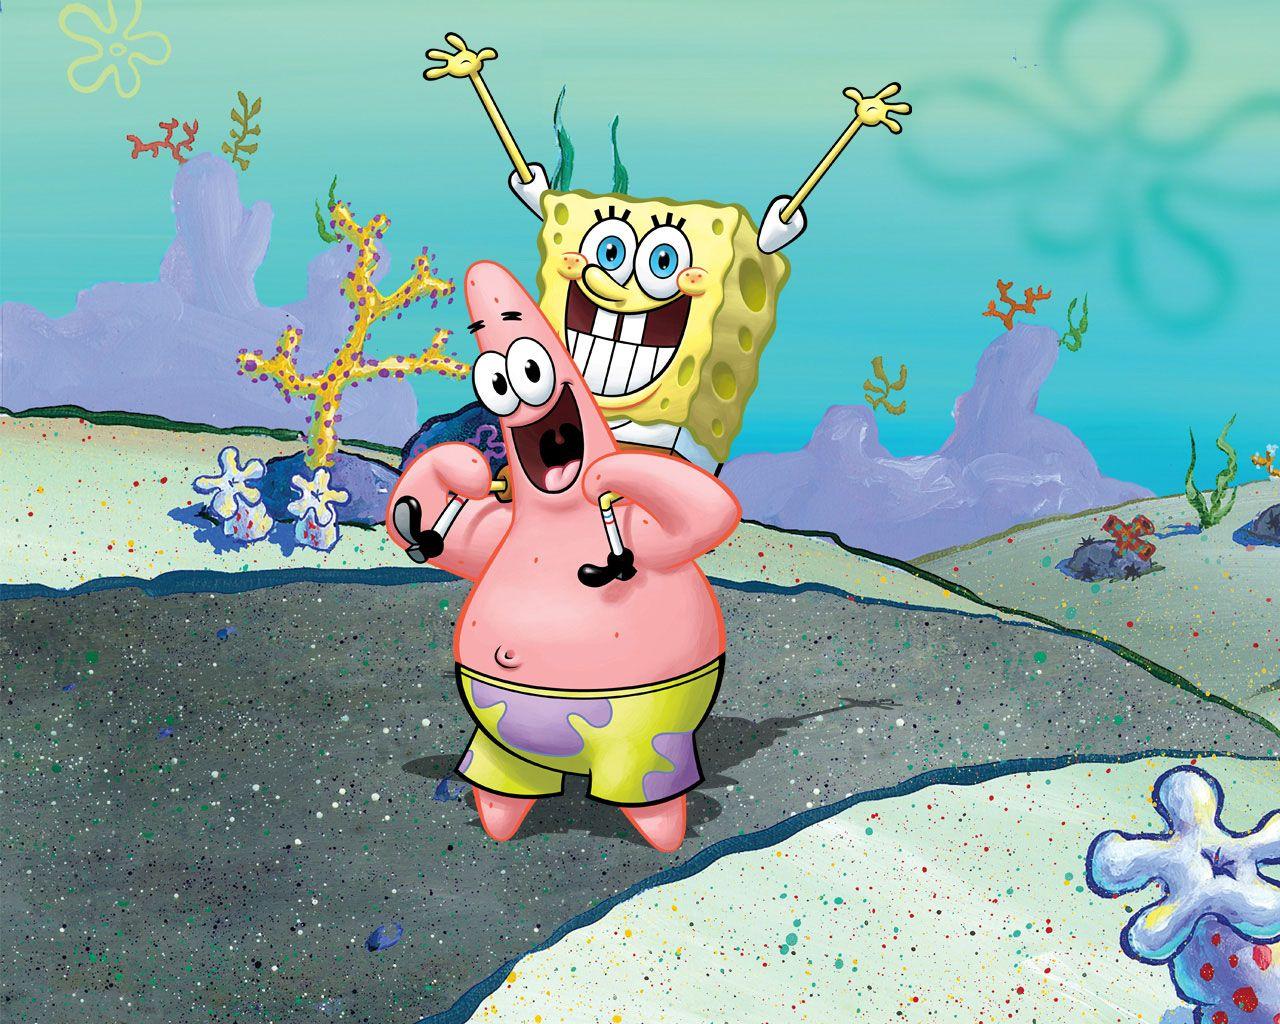 Spongebob Patrick In 2019 Spongebob Patrick Best Friend